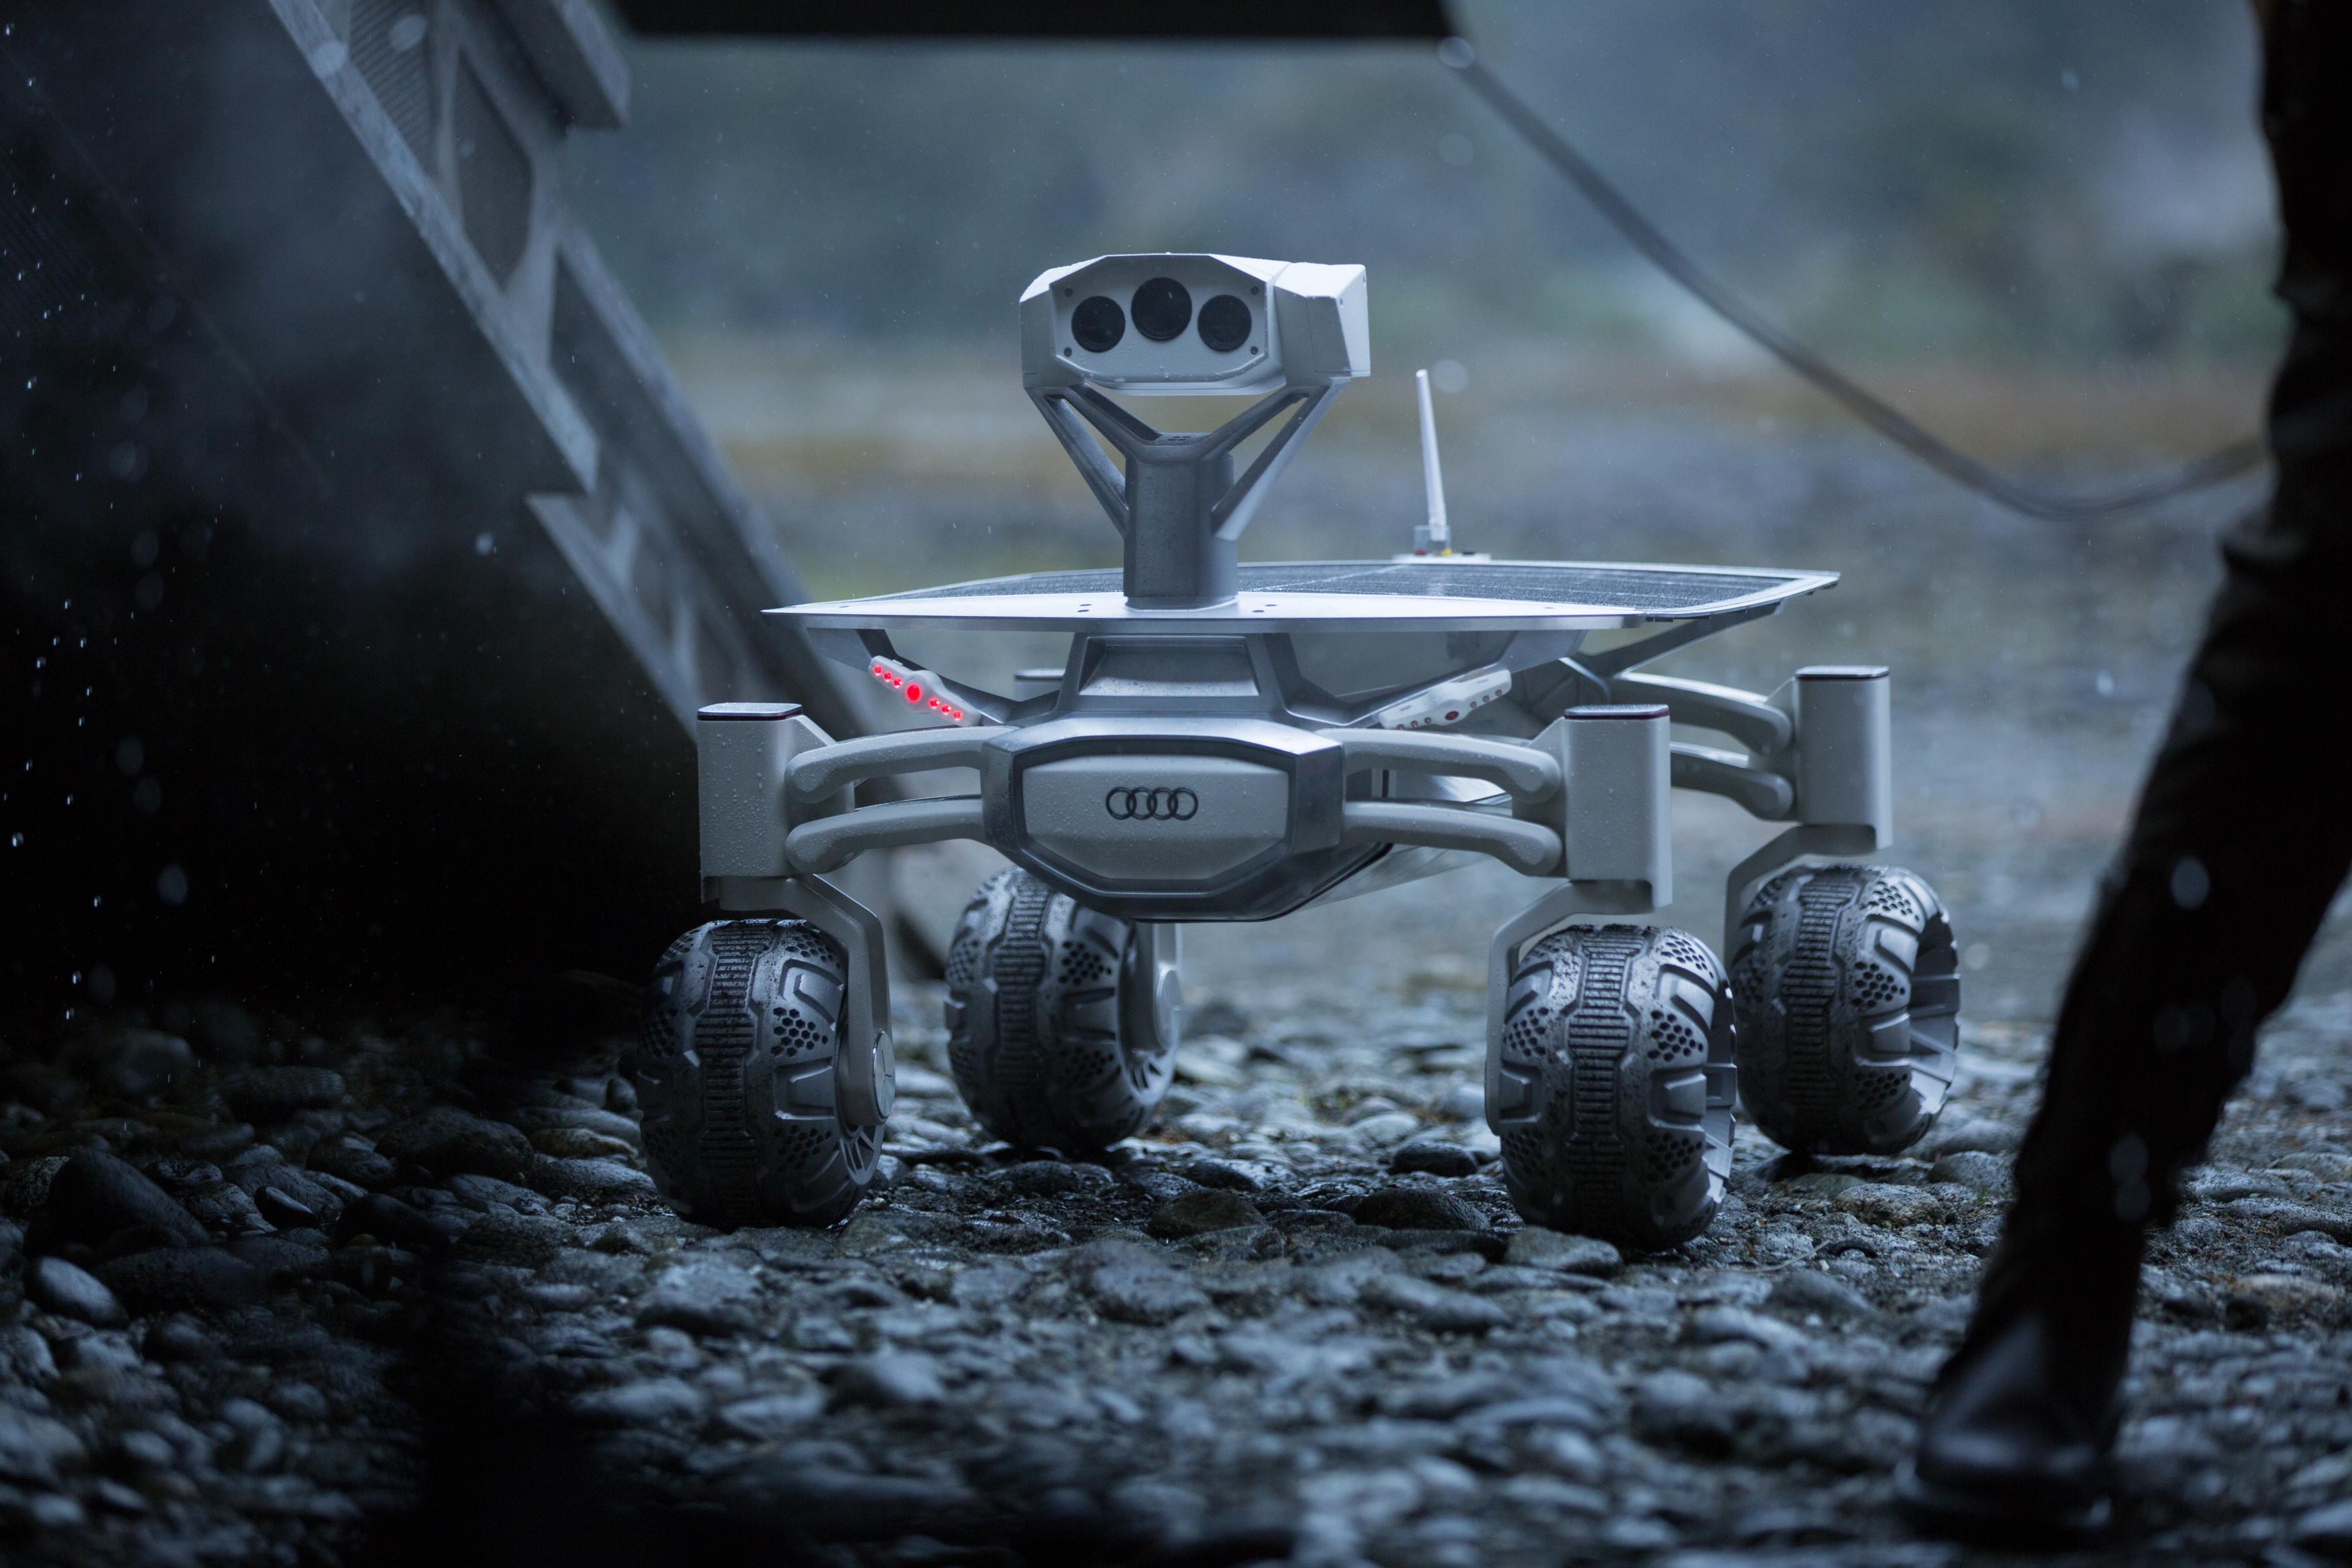 Moon rover Audi lunar quattro featured in â??Alien: Covenantâ?